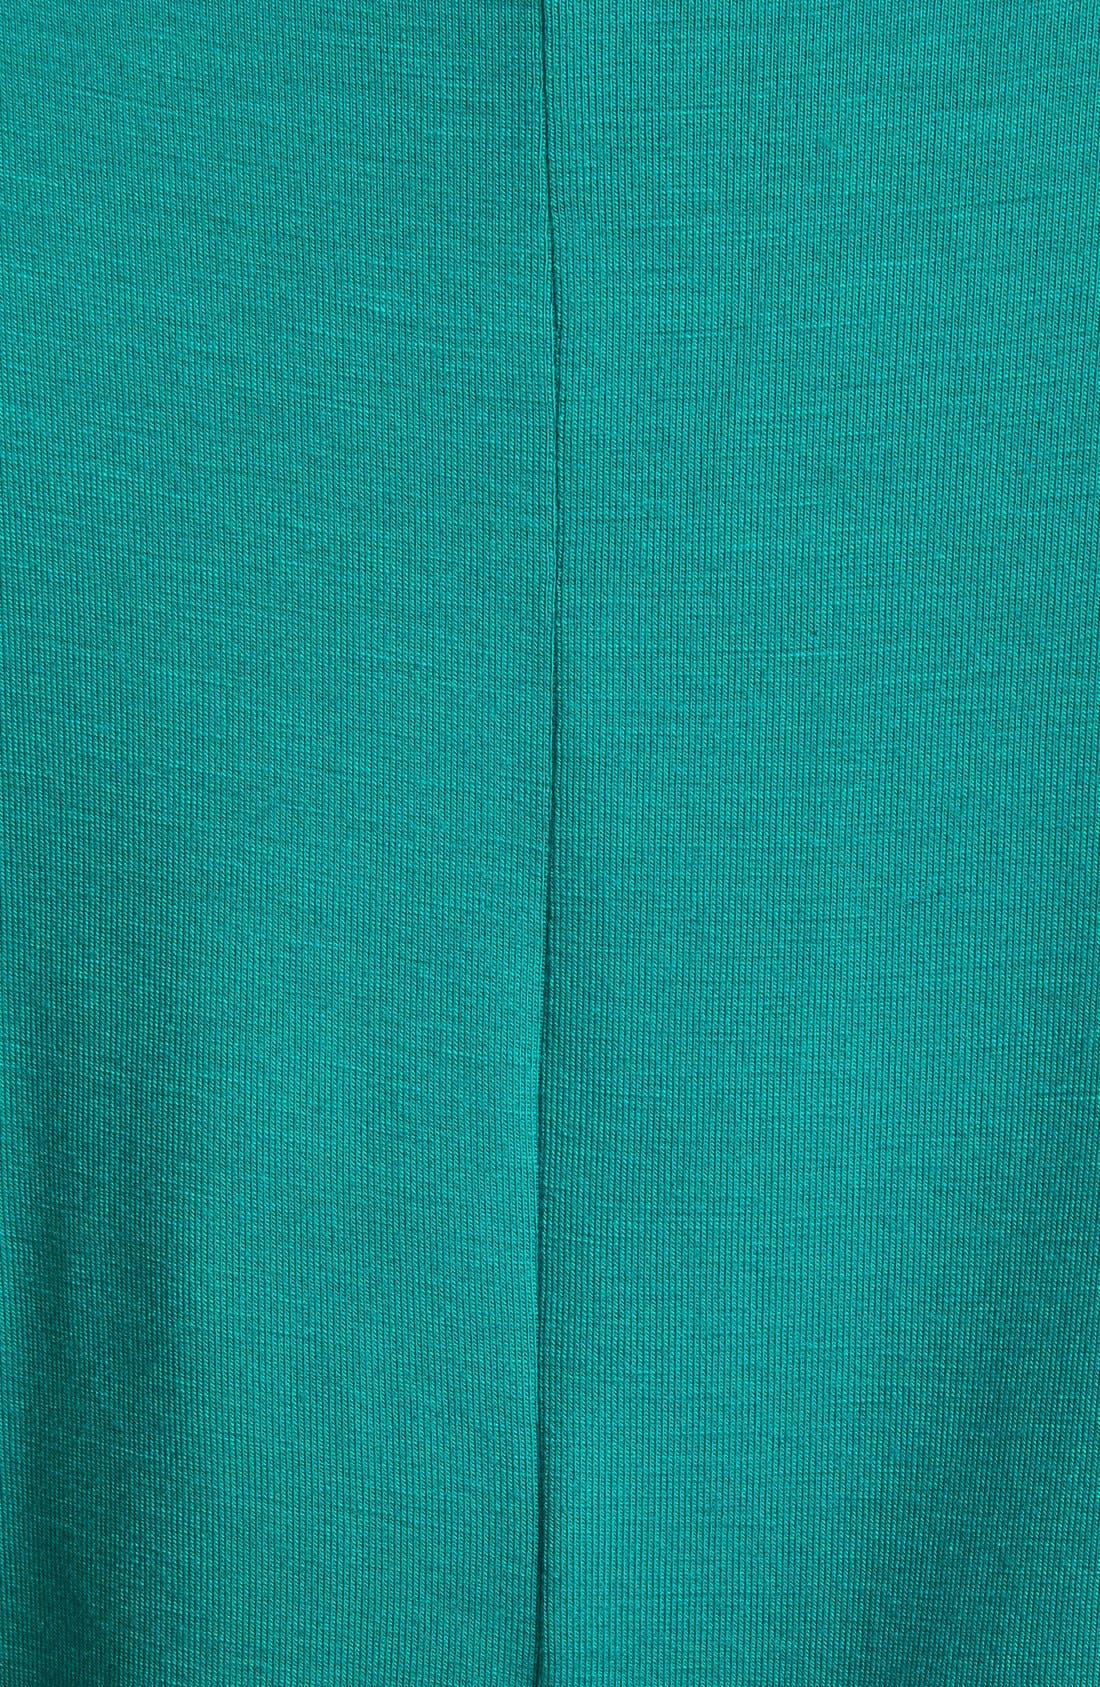 Alternate Image 3  - Loveappella Tie Waist Maxi Dress